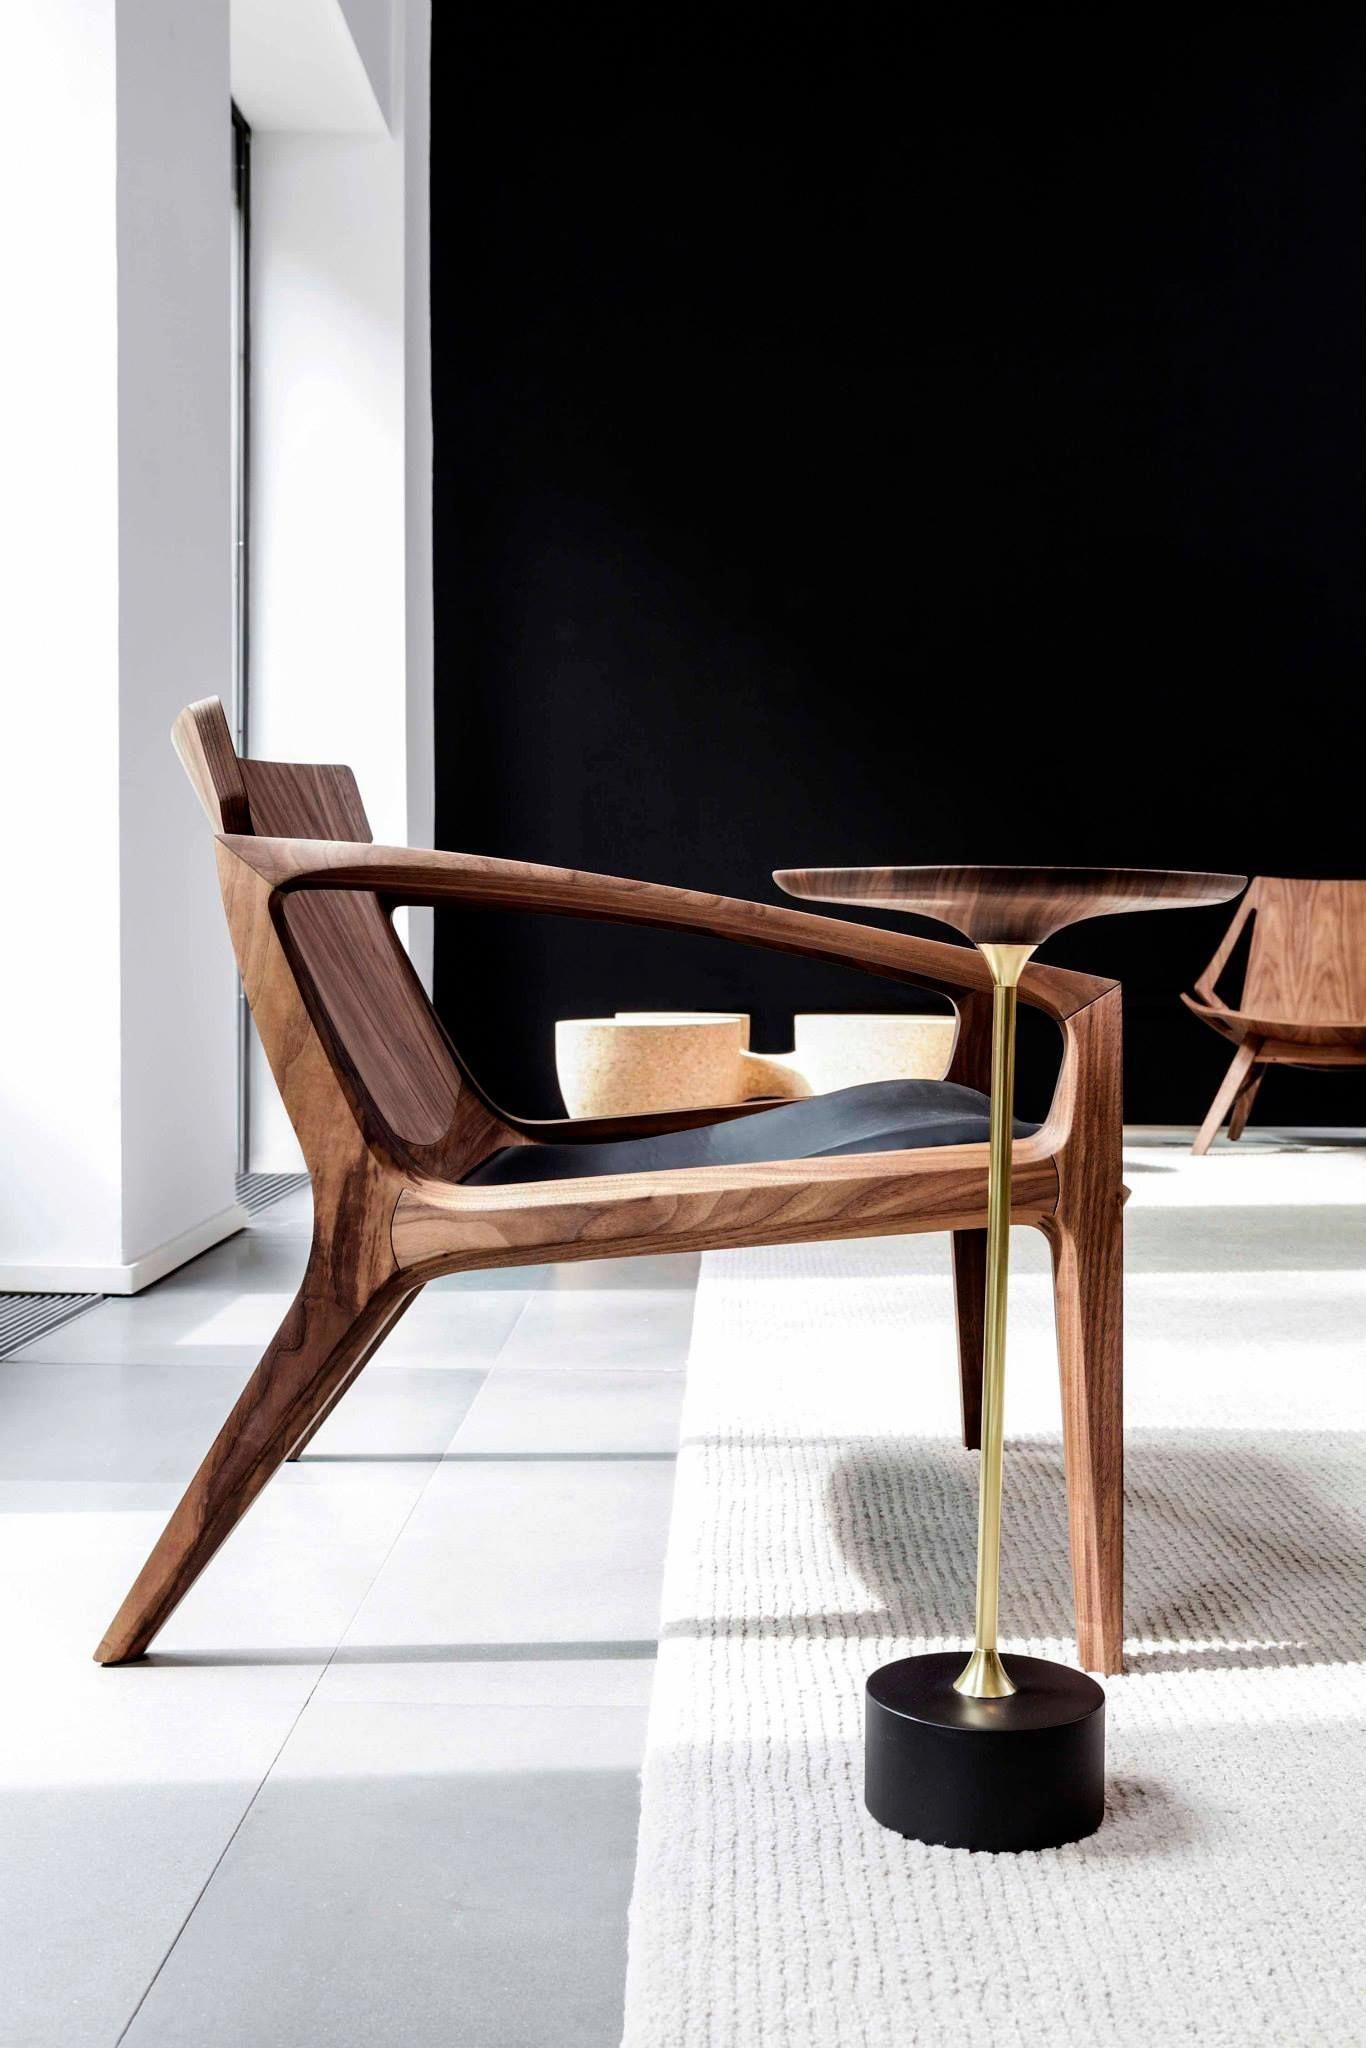 Luxury furniture los angeles inexpensivefurniture furnitureaccessories